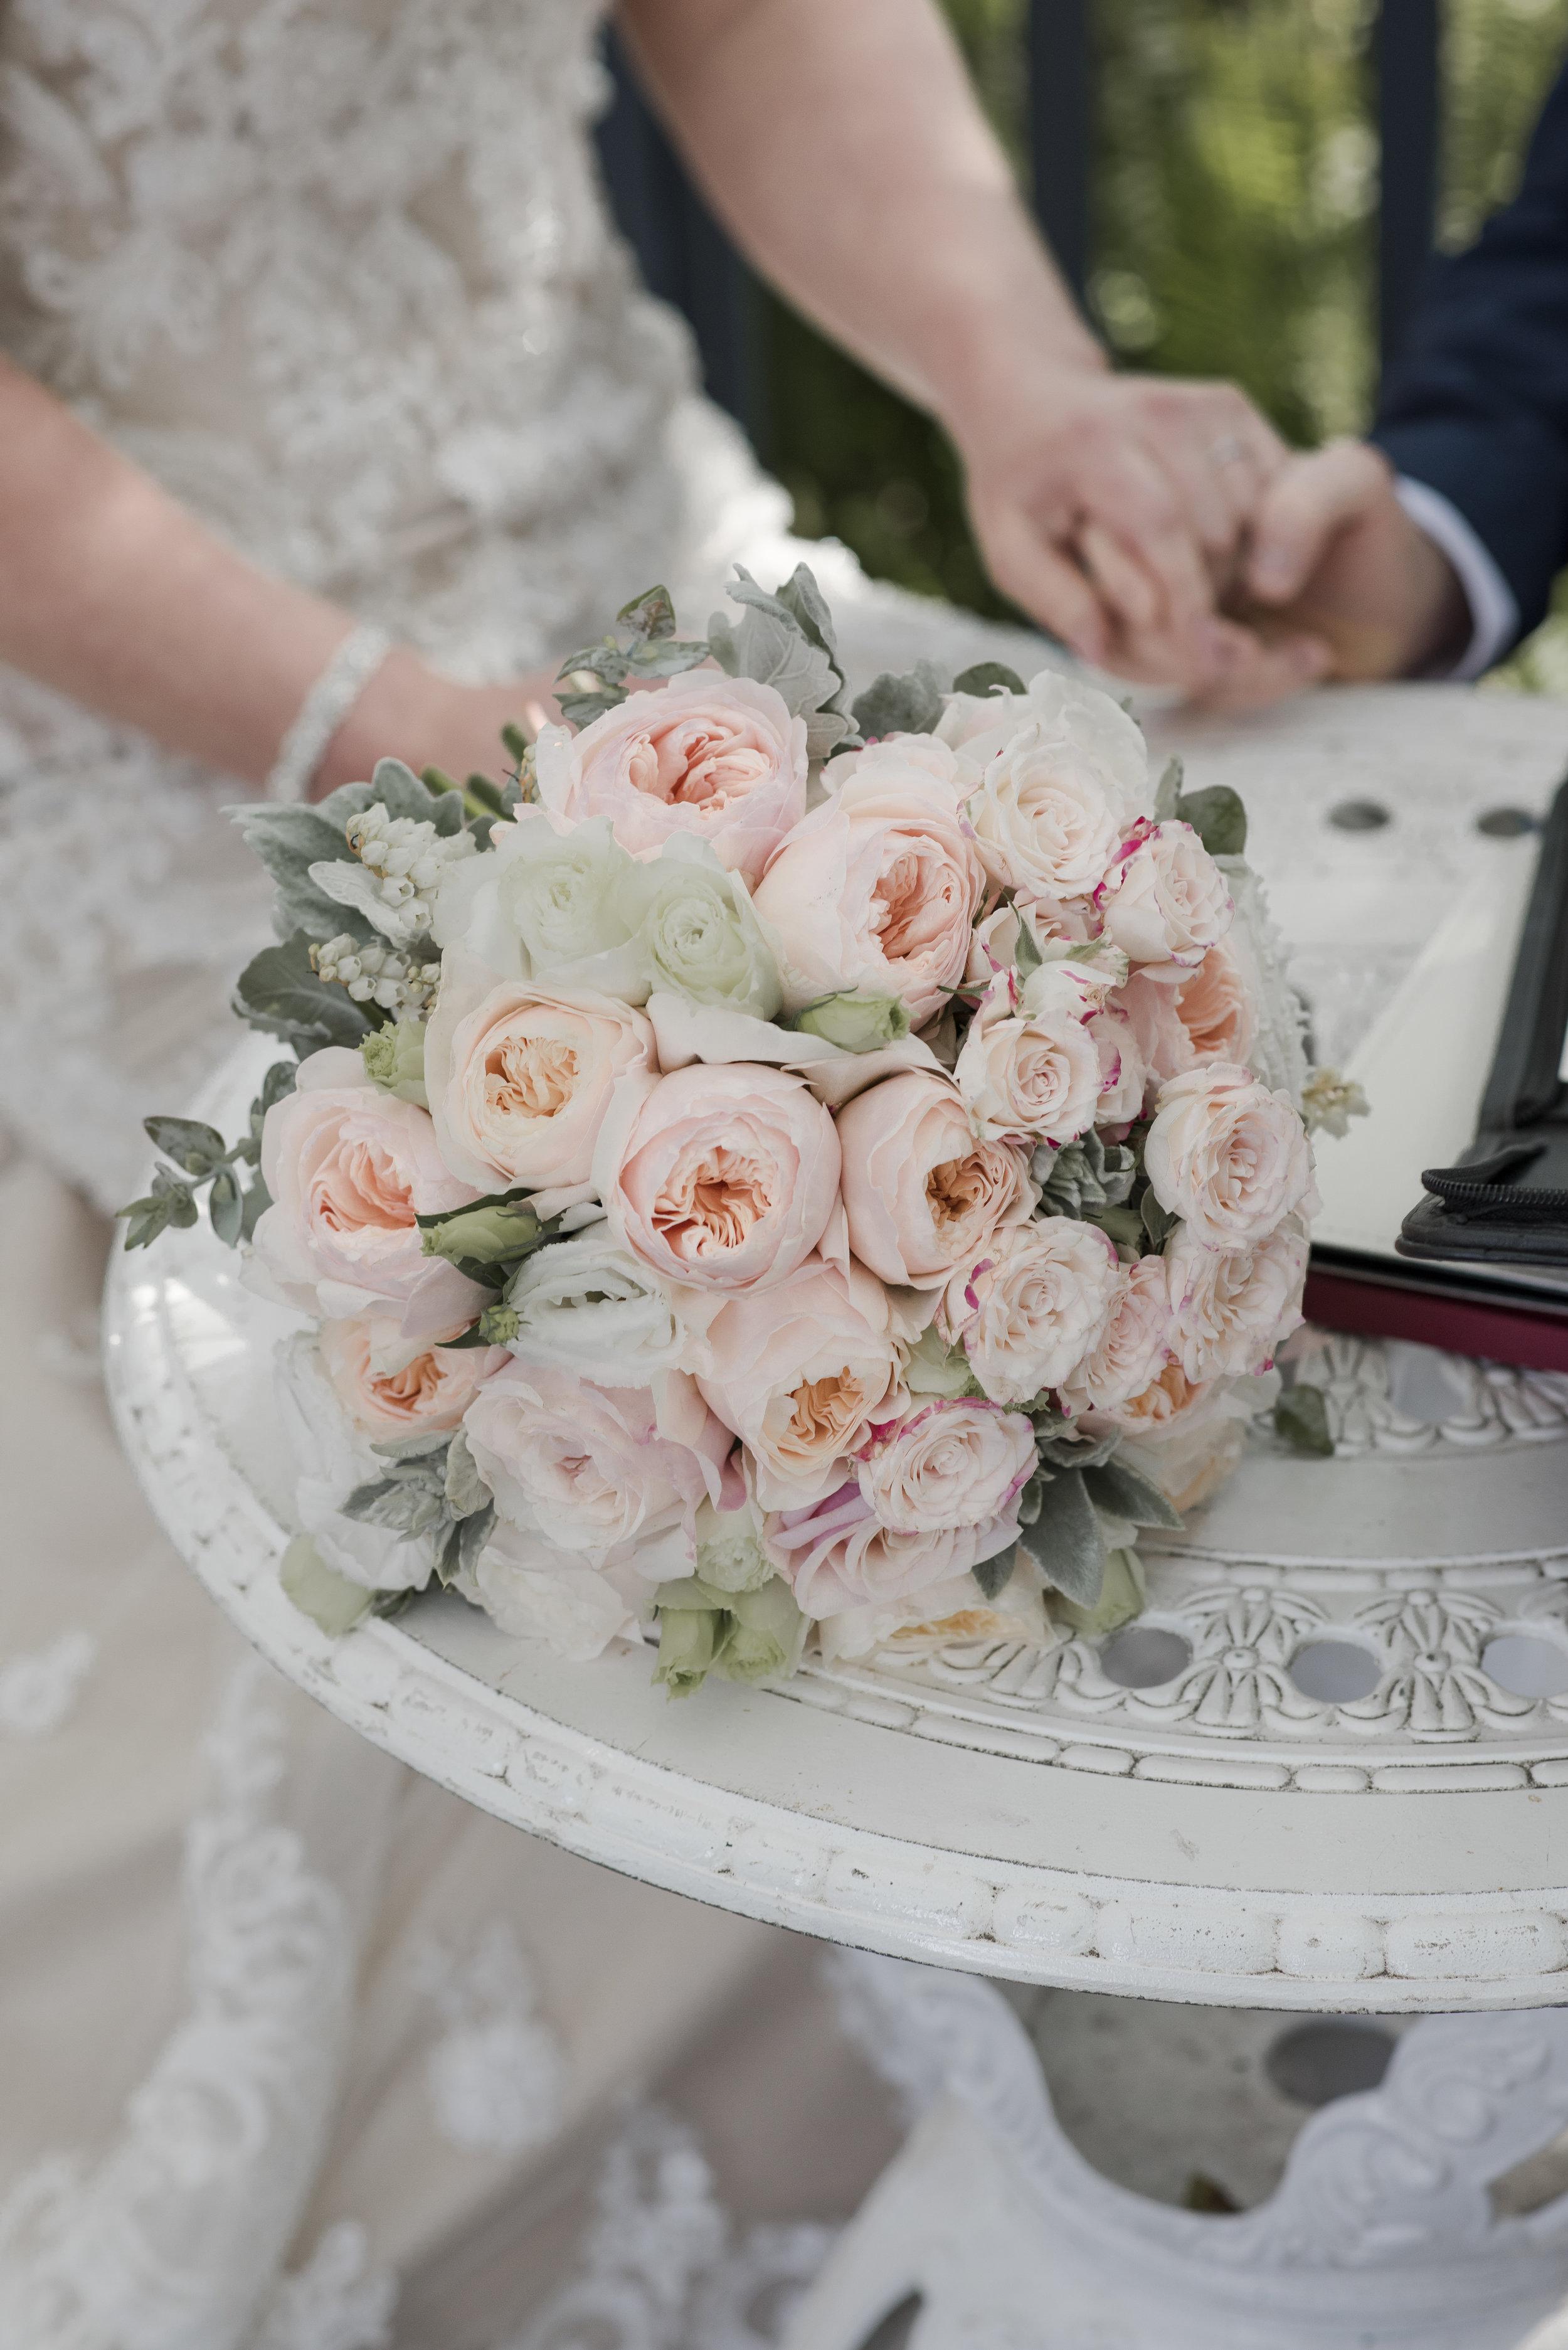 Teagan_Mayflower Weddings Photography_023.jpg